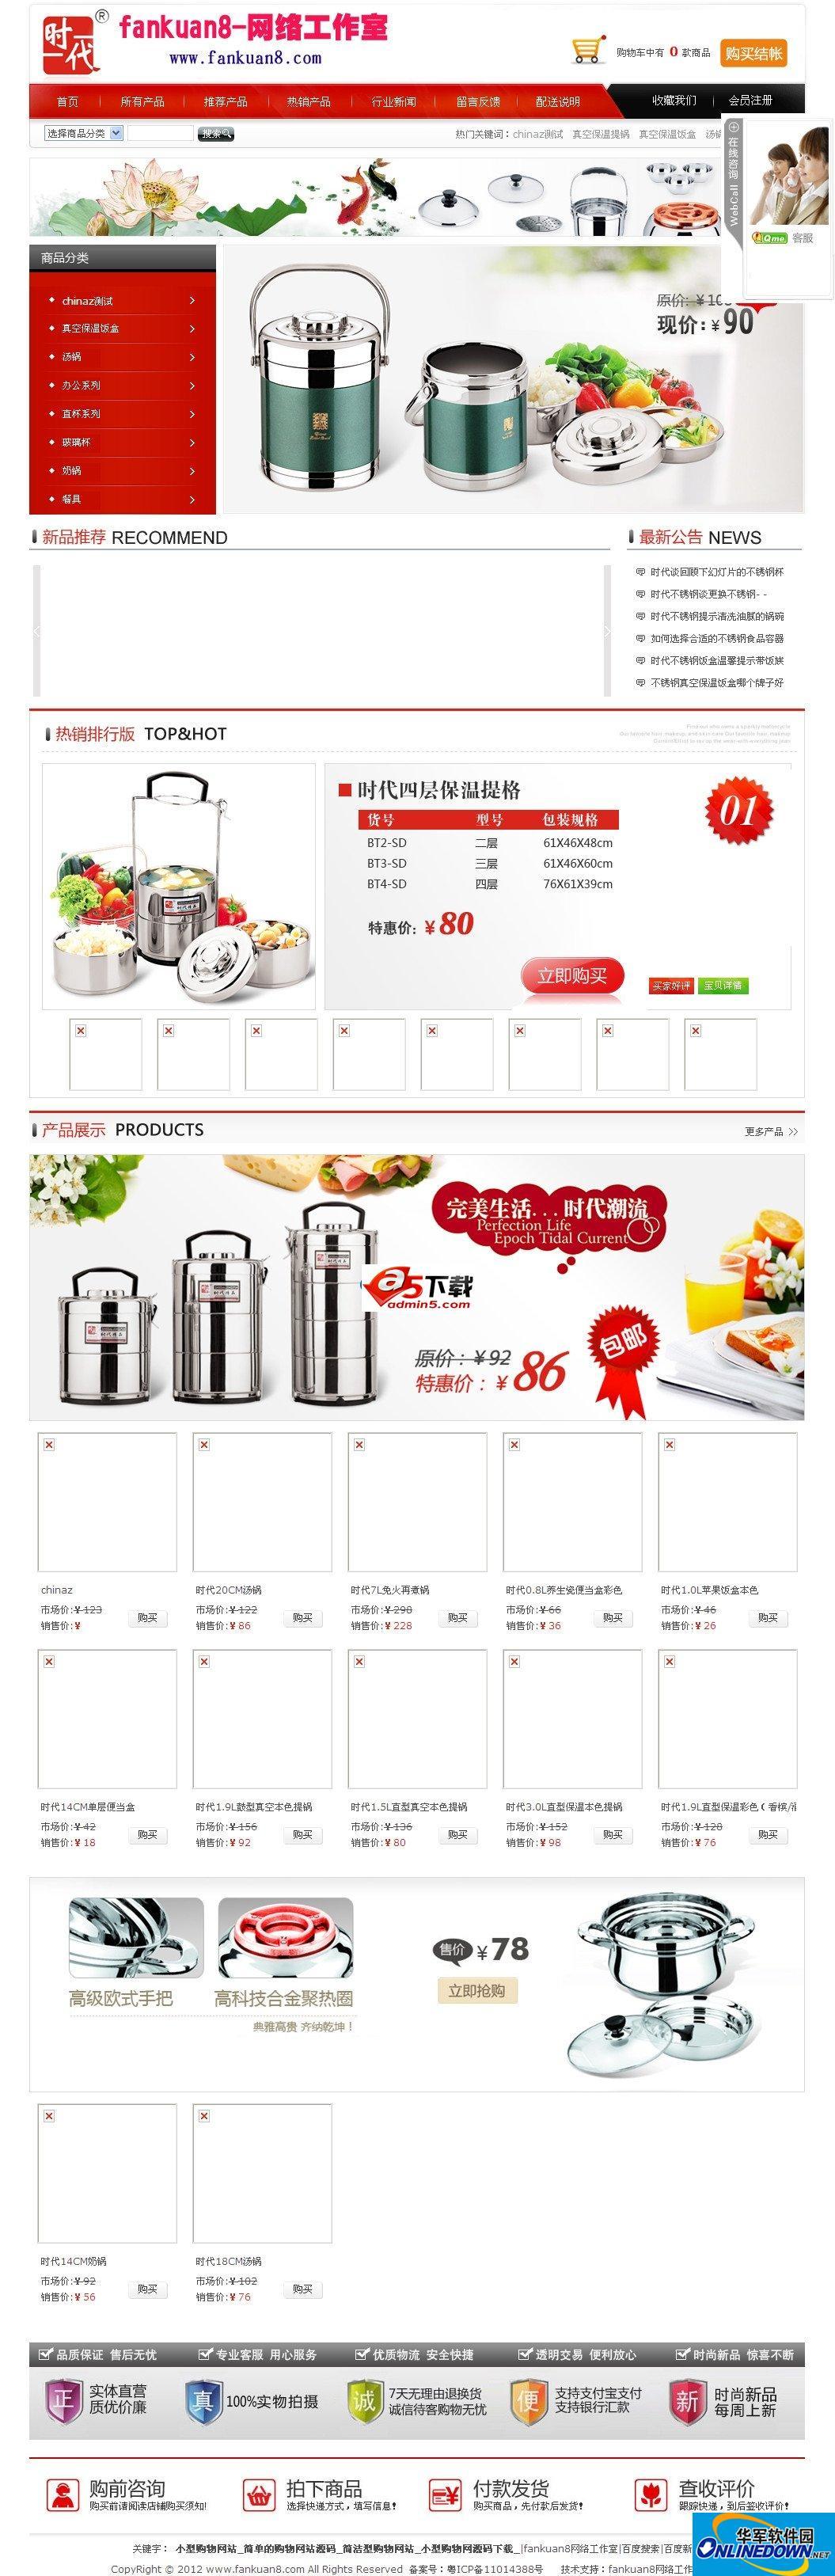 fankuan8 简洁型购物网站系统  G201205